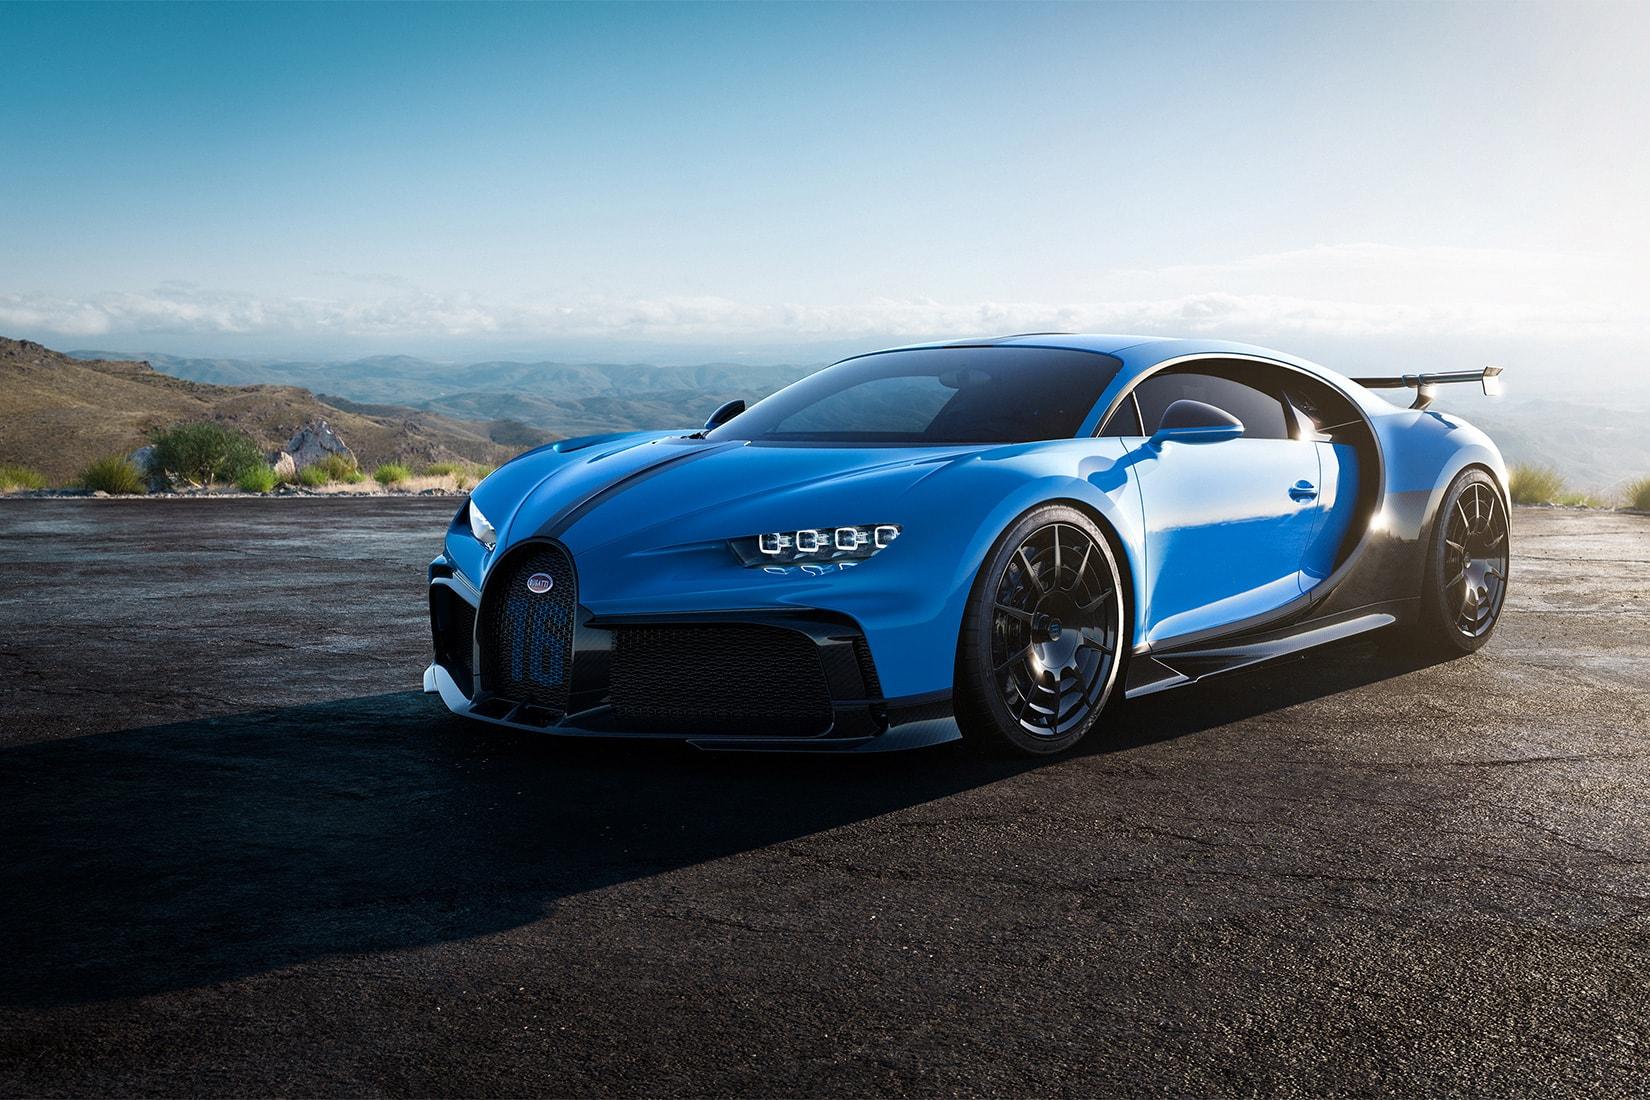 best luxury car brand Bugatti - Luxe Digital